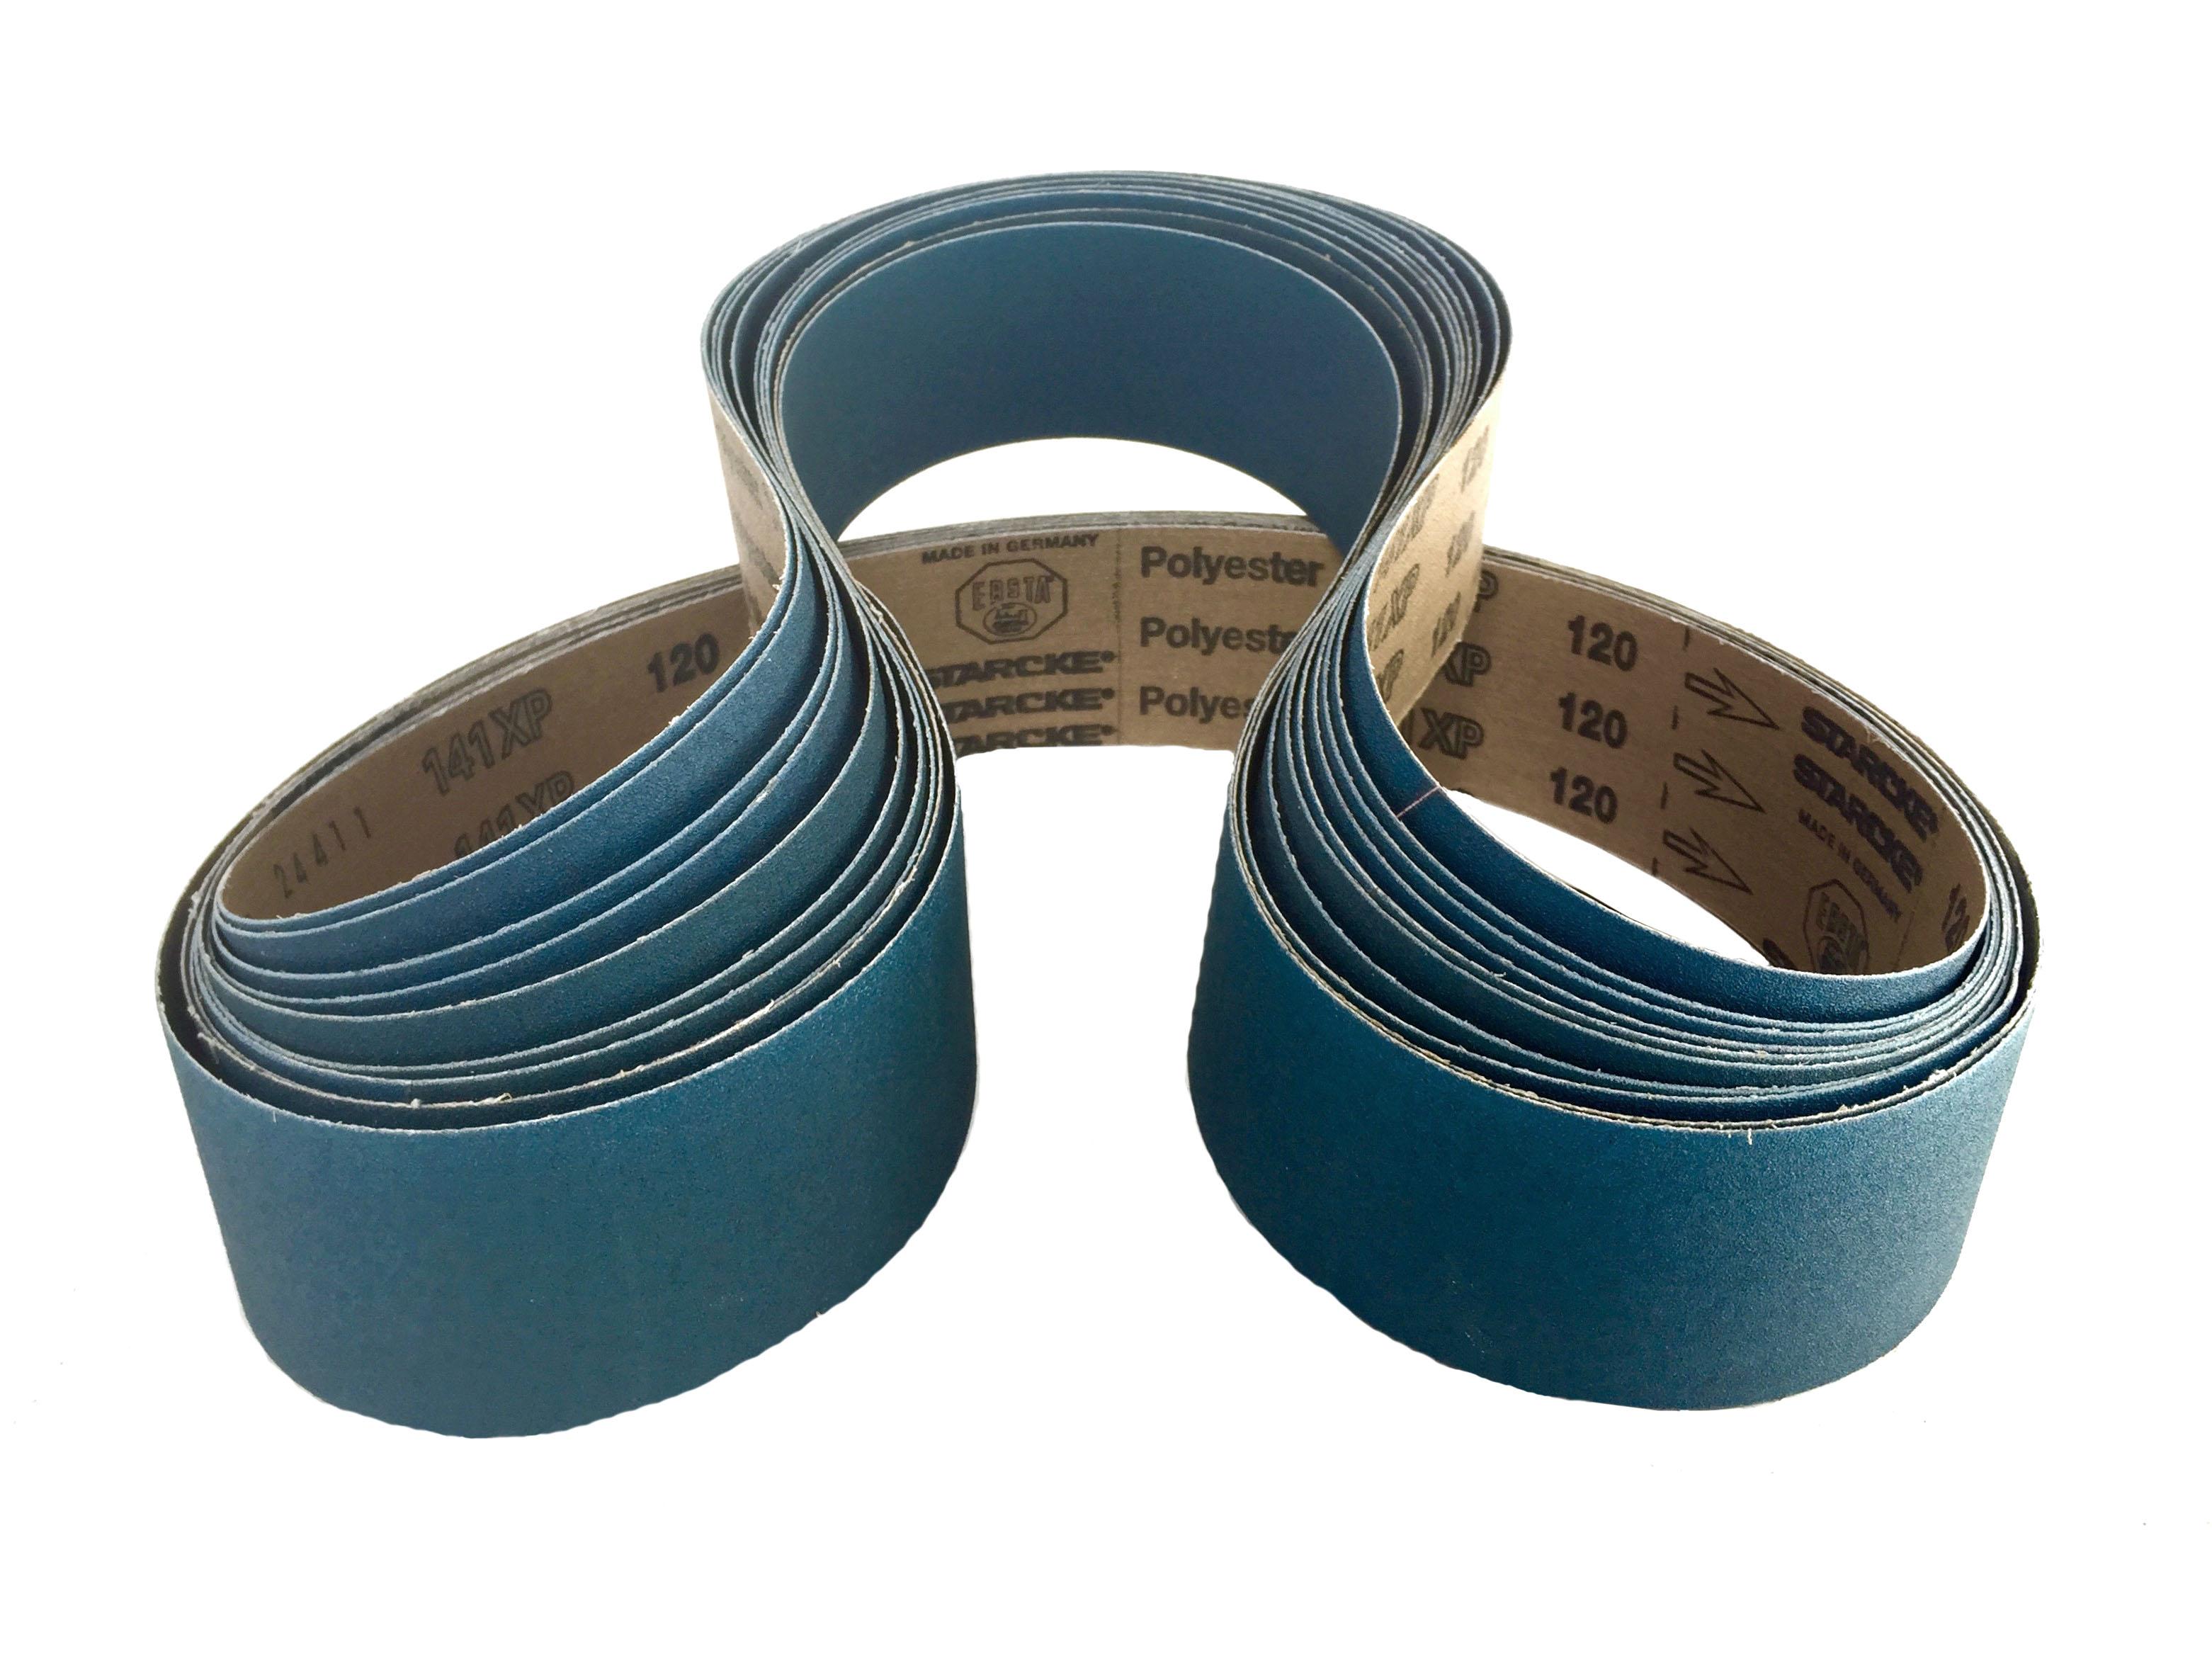 Sanding Belts 2 X 48 Zirconia Cloth Sander Belts 60 Grit 6 Pack